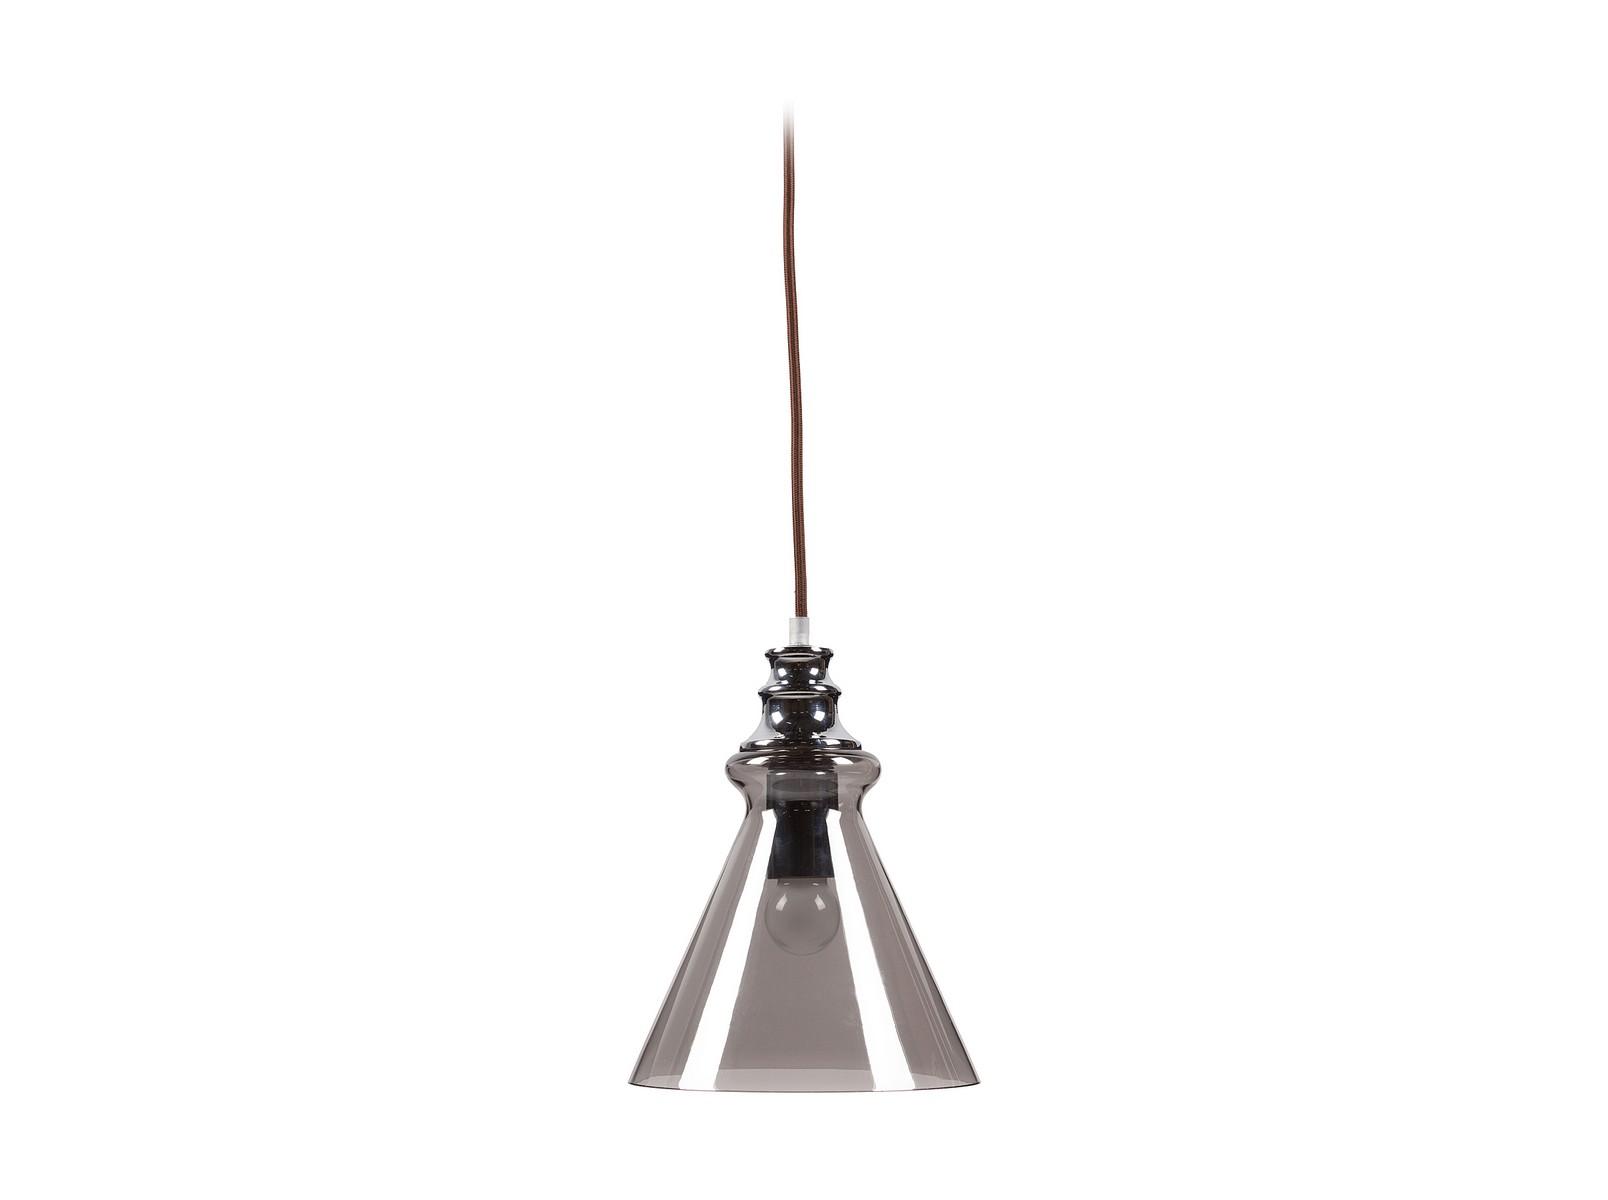 Подвесной светильник LunaПодвесные светильники<br>&amp;lt;div&amp;gt;Вид цоколя: Е27&amp;lt;/div&amp;gt;&amp;lt;div&amp;gt;Мощность лампы: 40W&amp;lt;/div&amp;gt;&amp;lt;div&amp;gt;Количество ламп: 1&amp;lt;/div&amp;gt;&amp;lt;div&amp;gt;Наличие ламп: нет&amp;lt;/div&amp;gt;<br><br>Material: Стекло<br>Height см: 28<br>Diameter см: 20